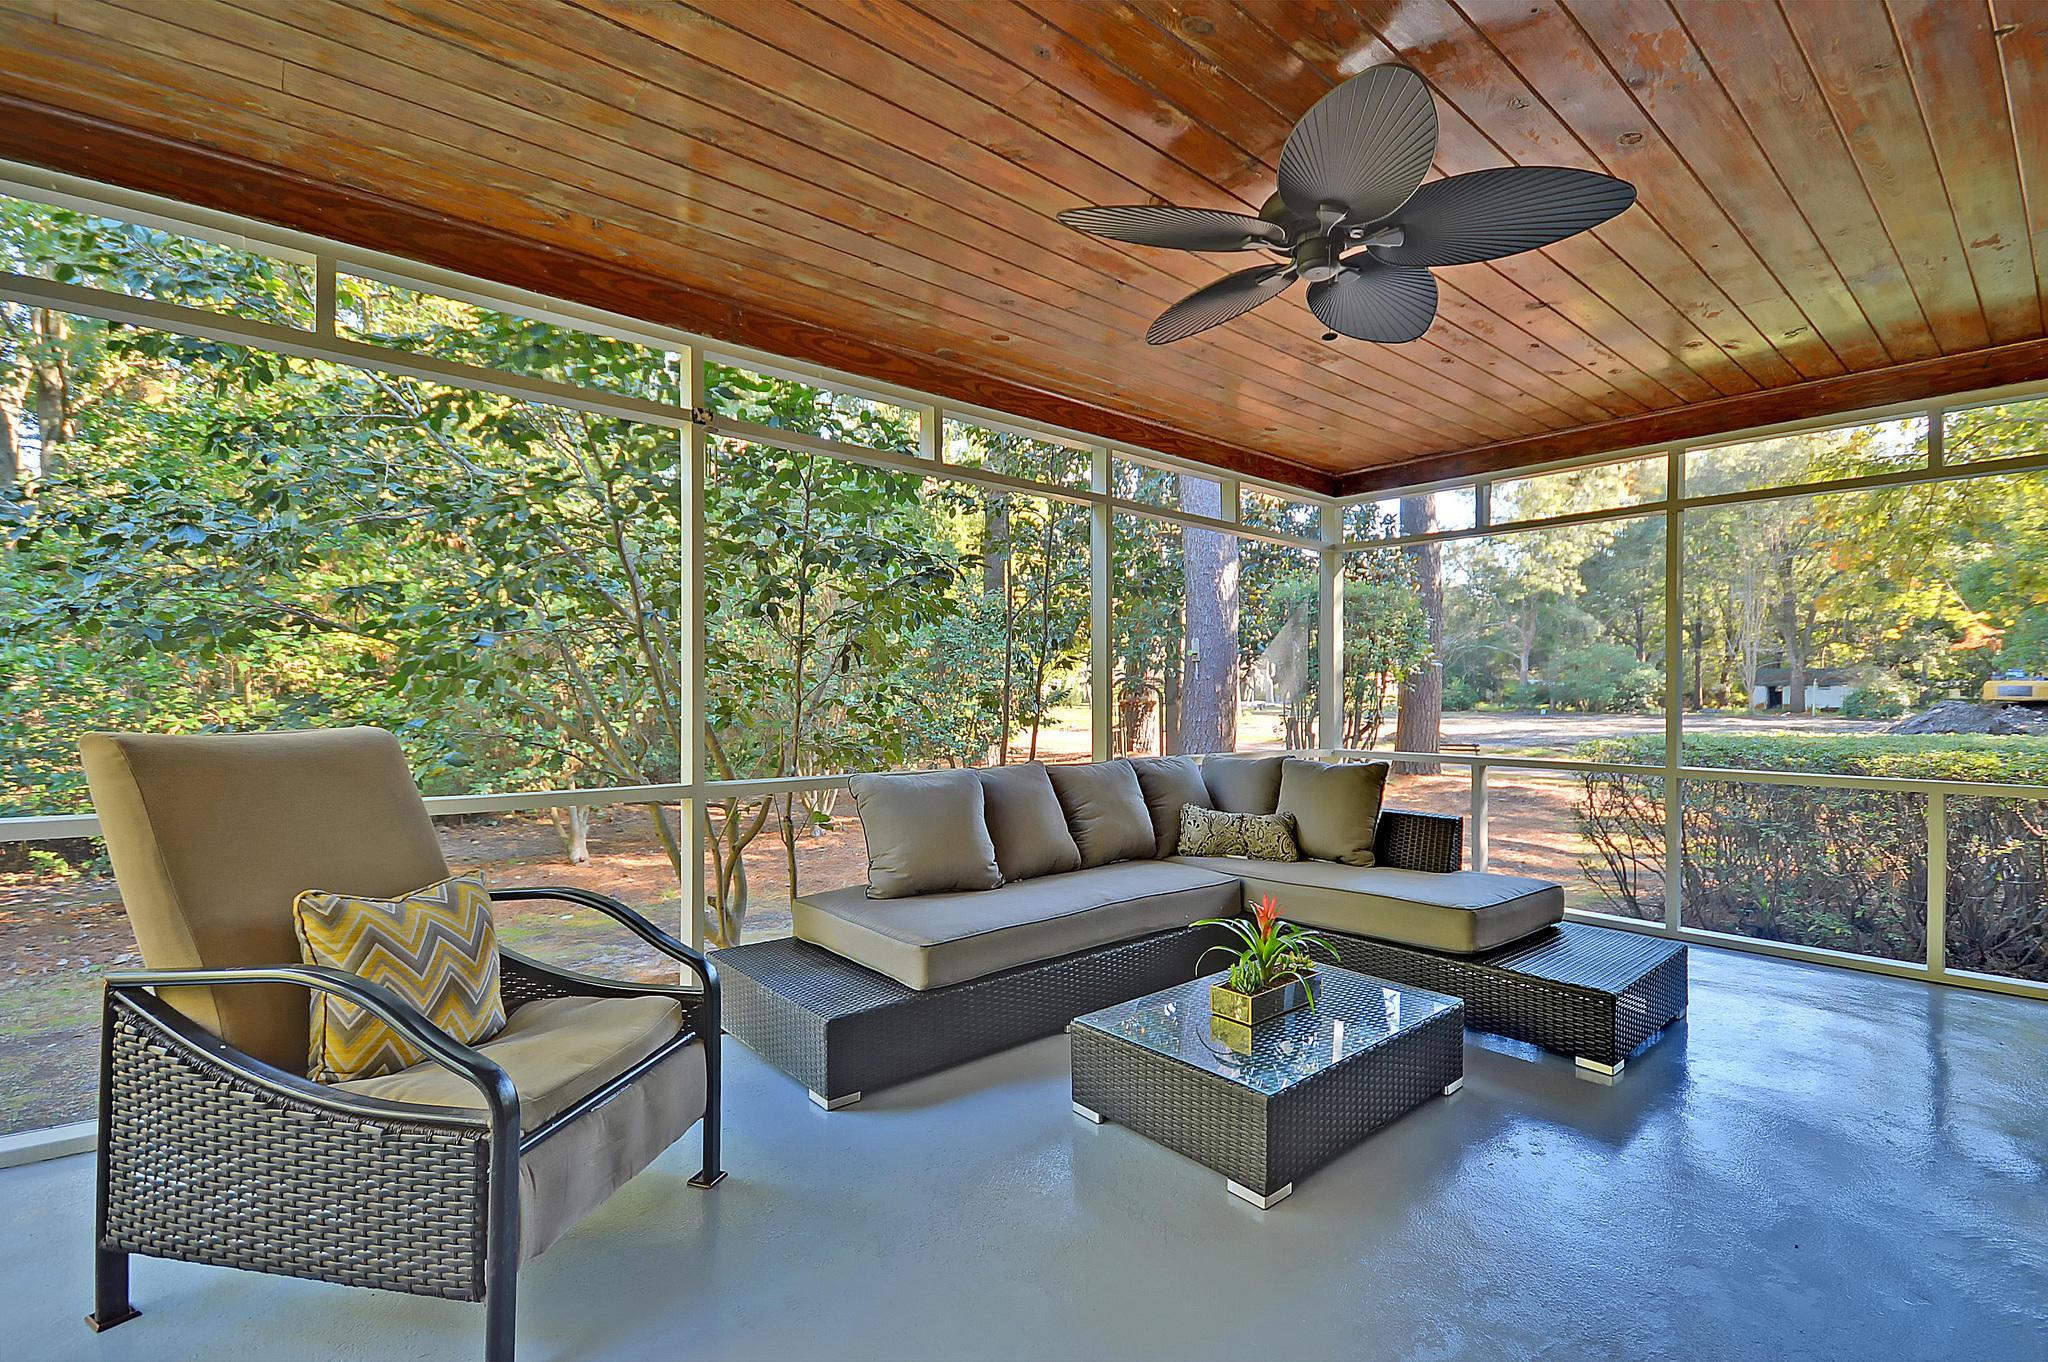 Edgewater Park Homes For Sale - 1356 Emory, Charleston, SC - 47